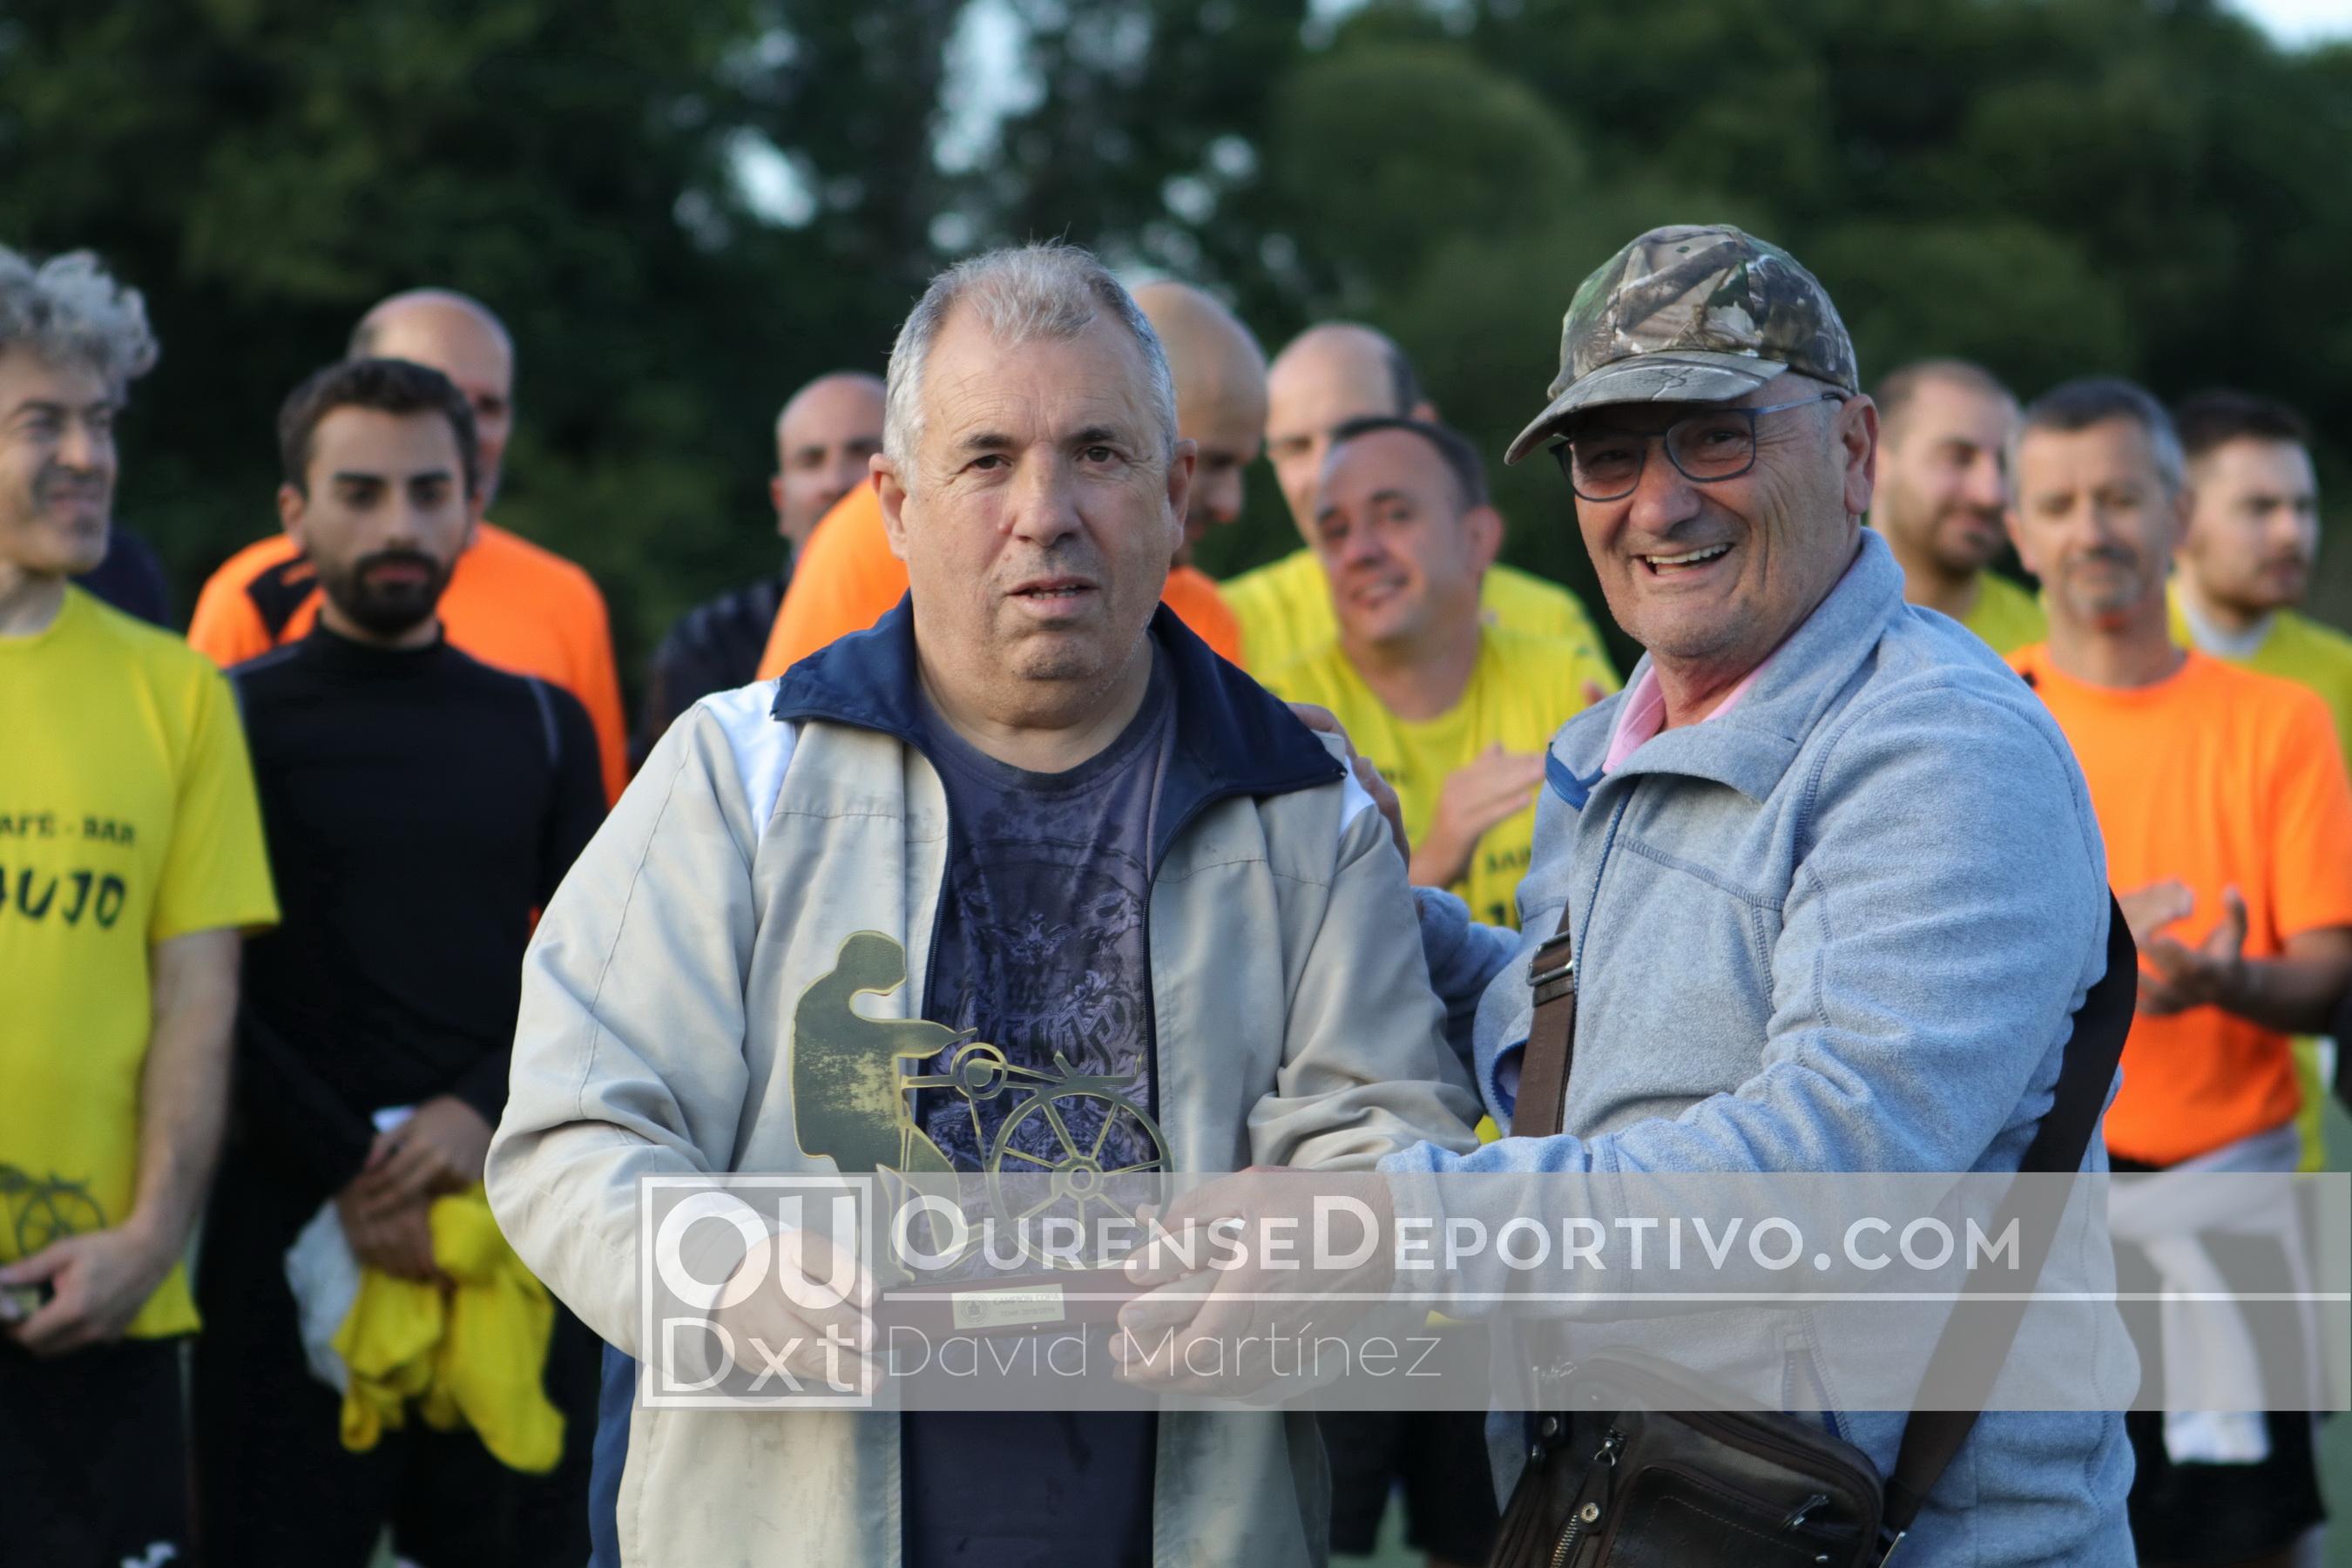 ourensedeportivo_david_martinez (11)